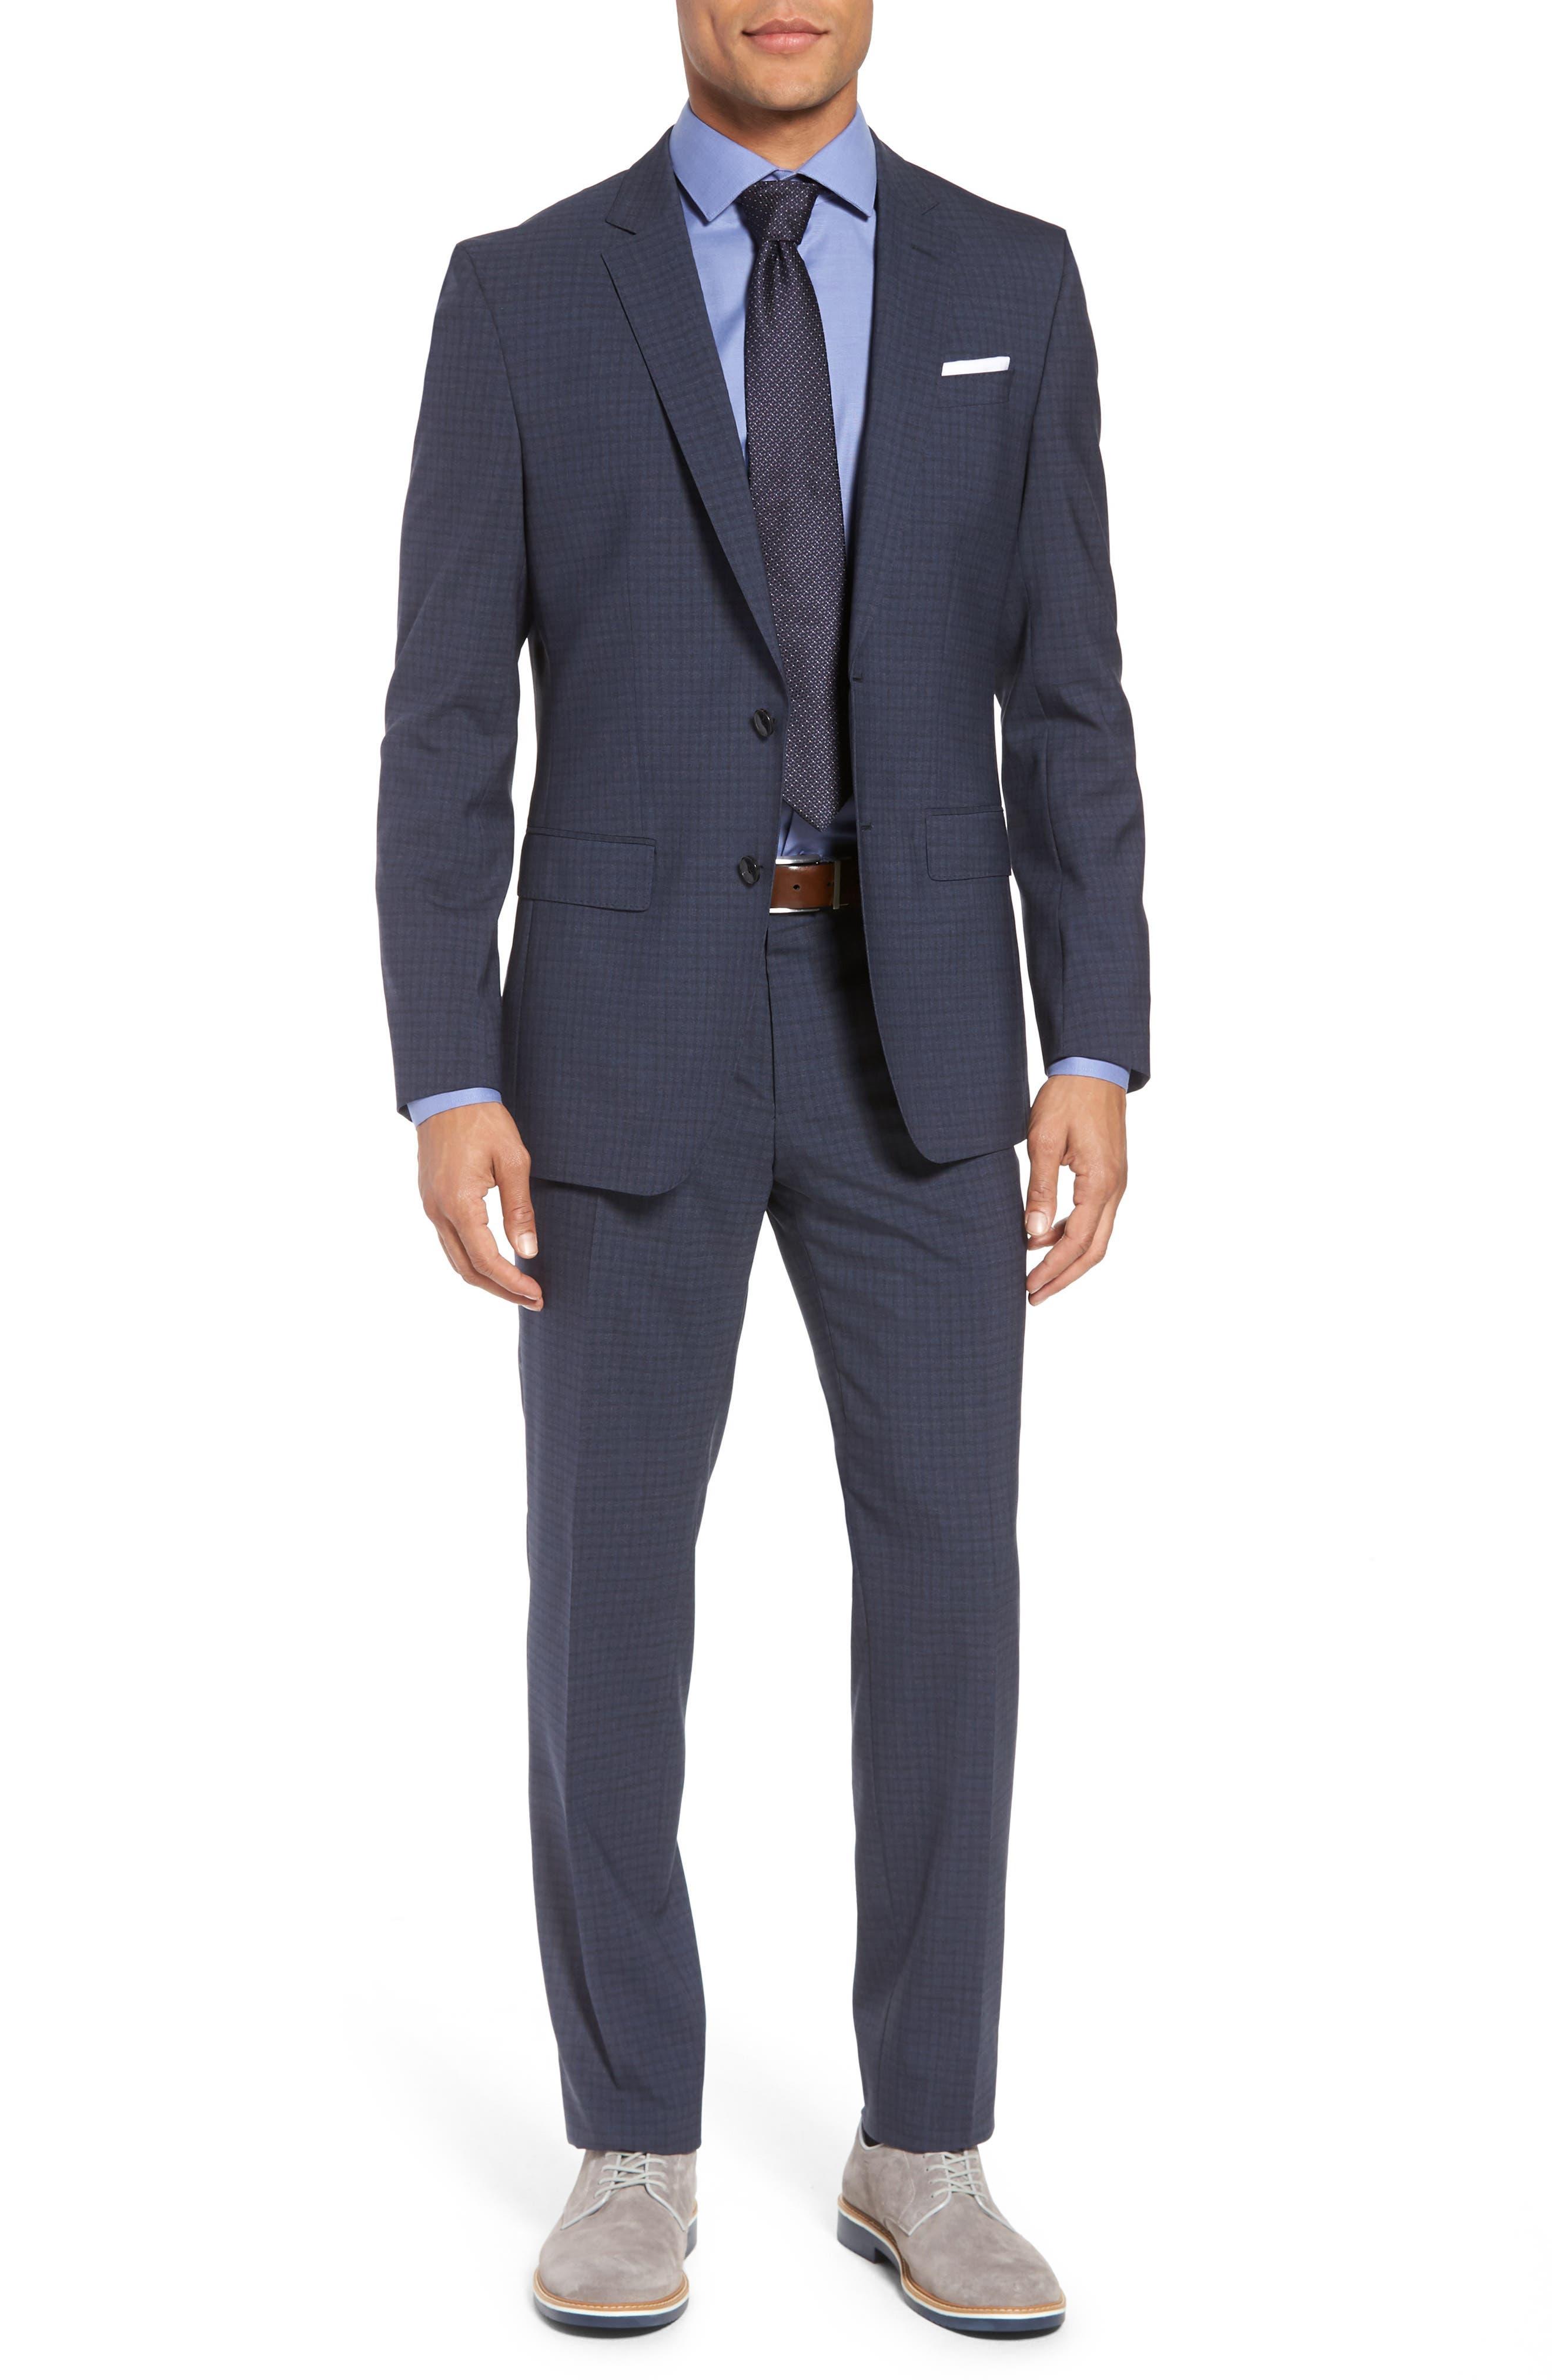 Huge/Genius Trim Fit Check Wool Suit,                         Main,                         color, Blue/ Brown/ Charcoal